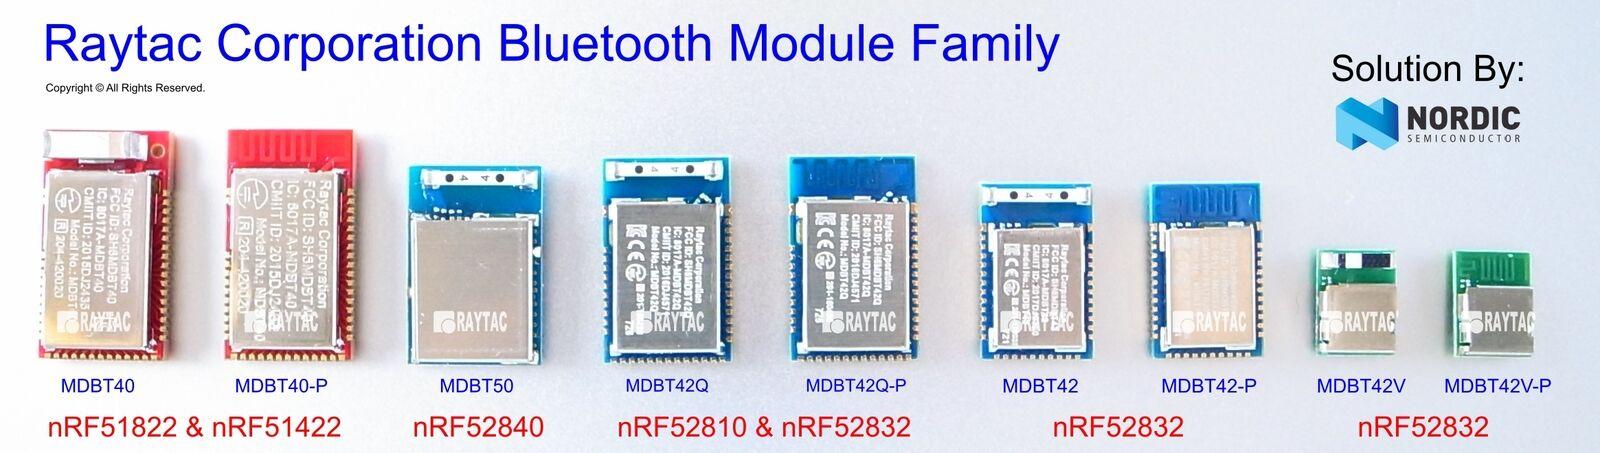 Nordic Bluetooth Module Specialist